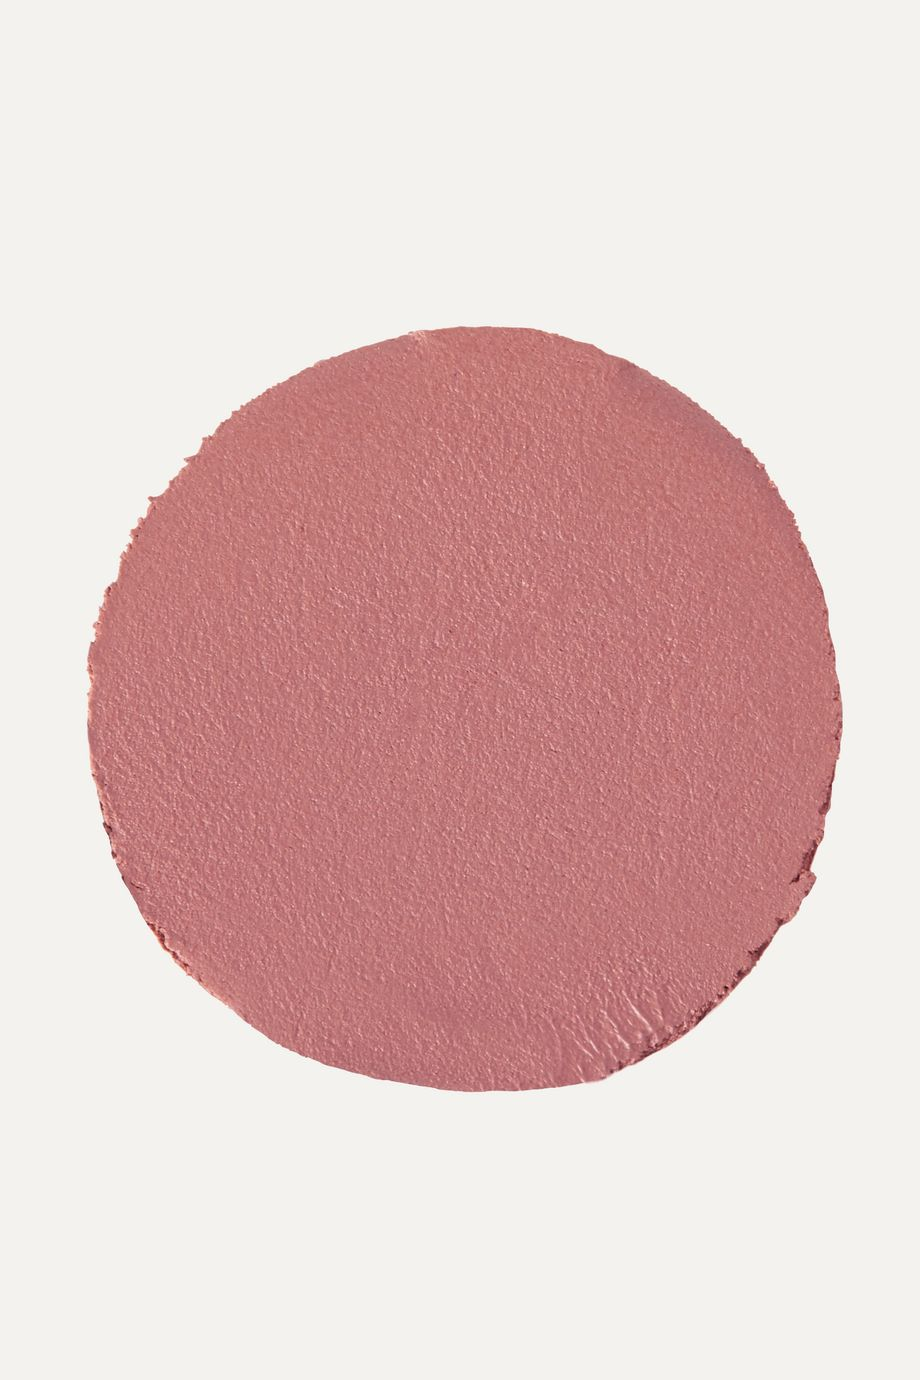 Illamasqua Antimatter Lipstick - Seren